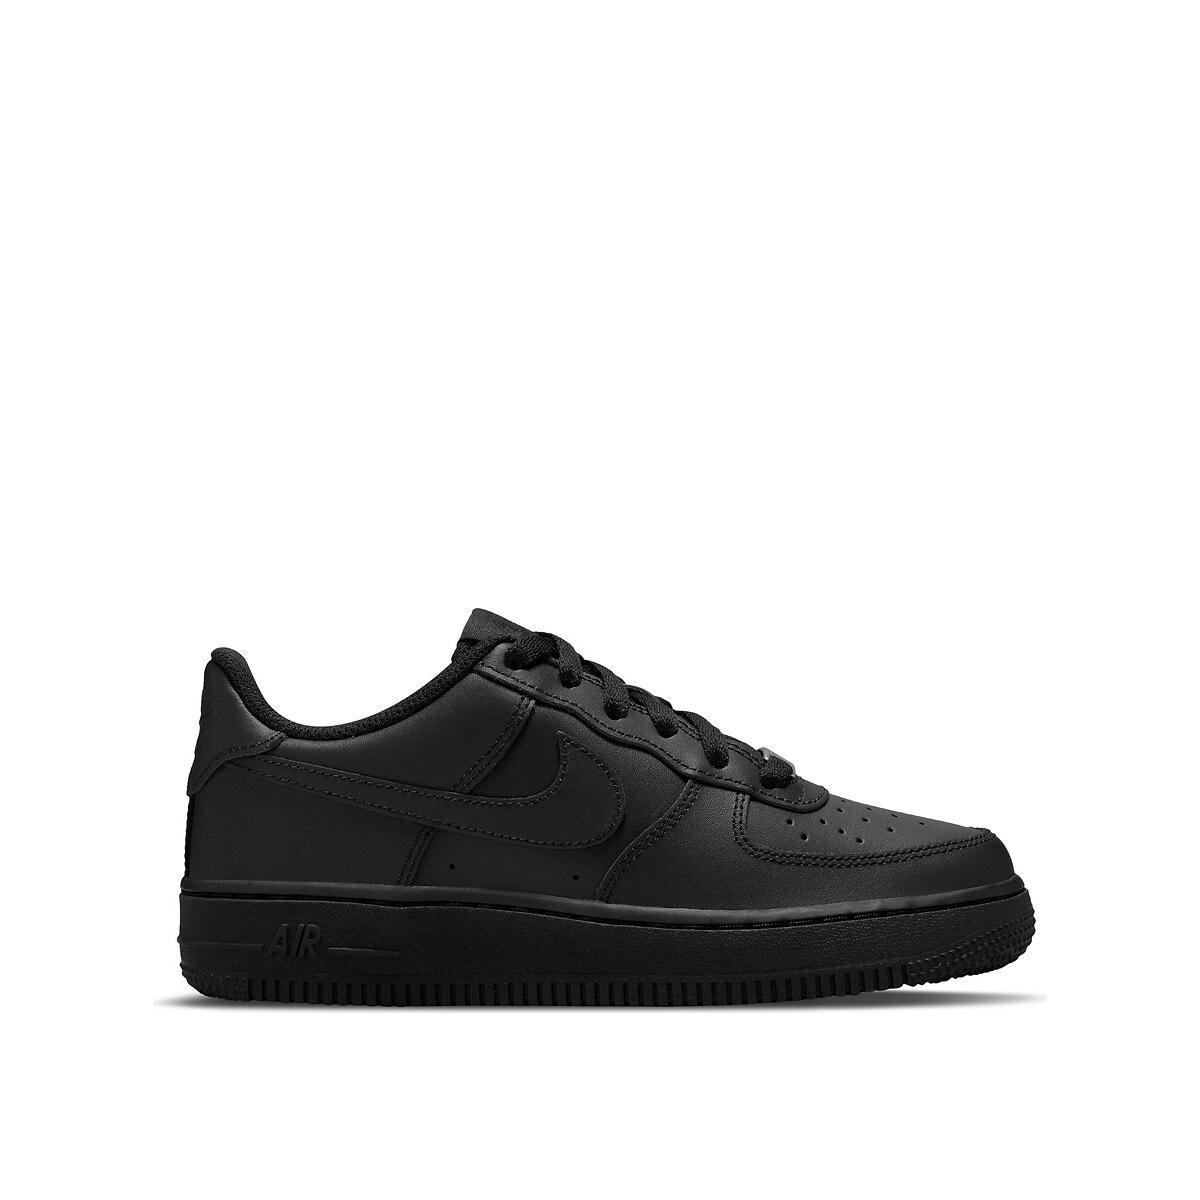 Nike af1 noir | La Redoute